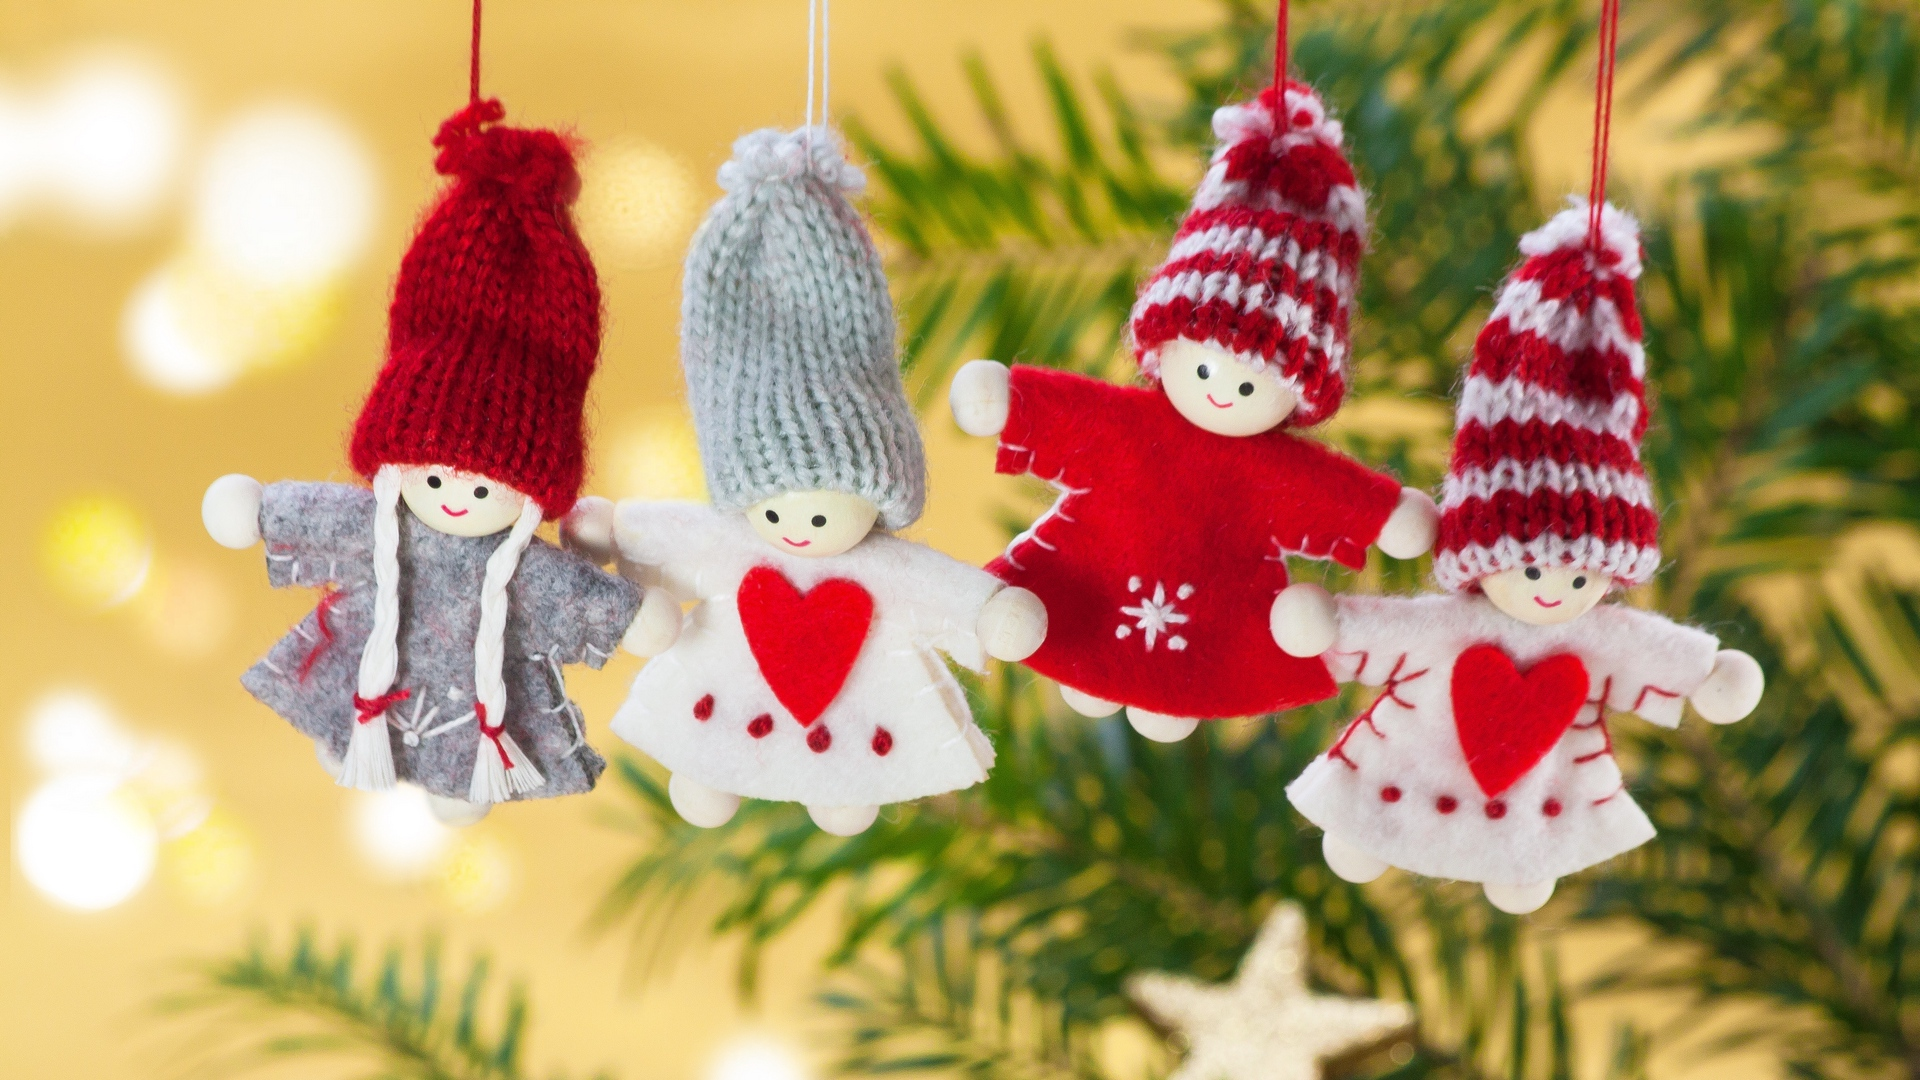 download wallpaper: poppetjes in de kerstboom wallpaper